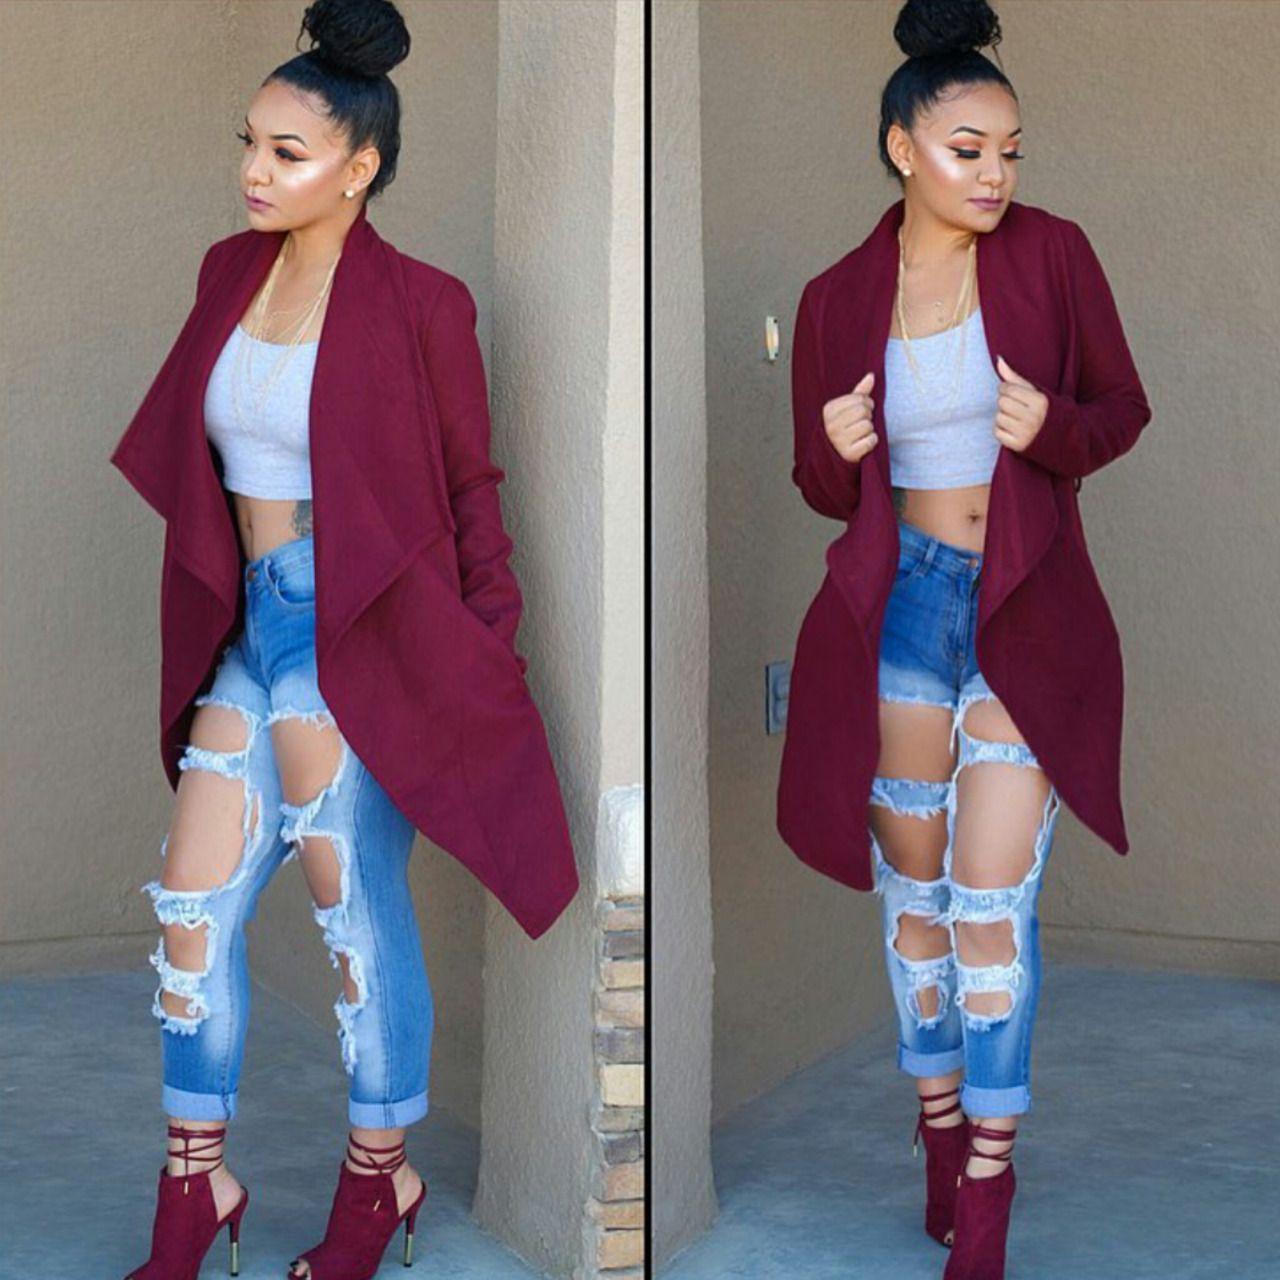 Black Girl Swag Outfits: Www.kingriches.mayvenn.com Bundles /hair Etc. In 2019